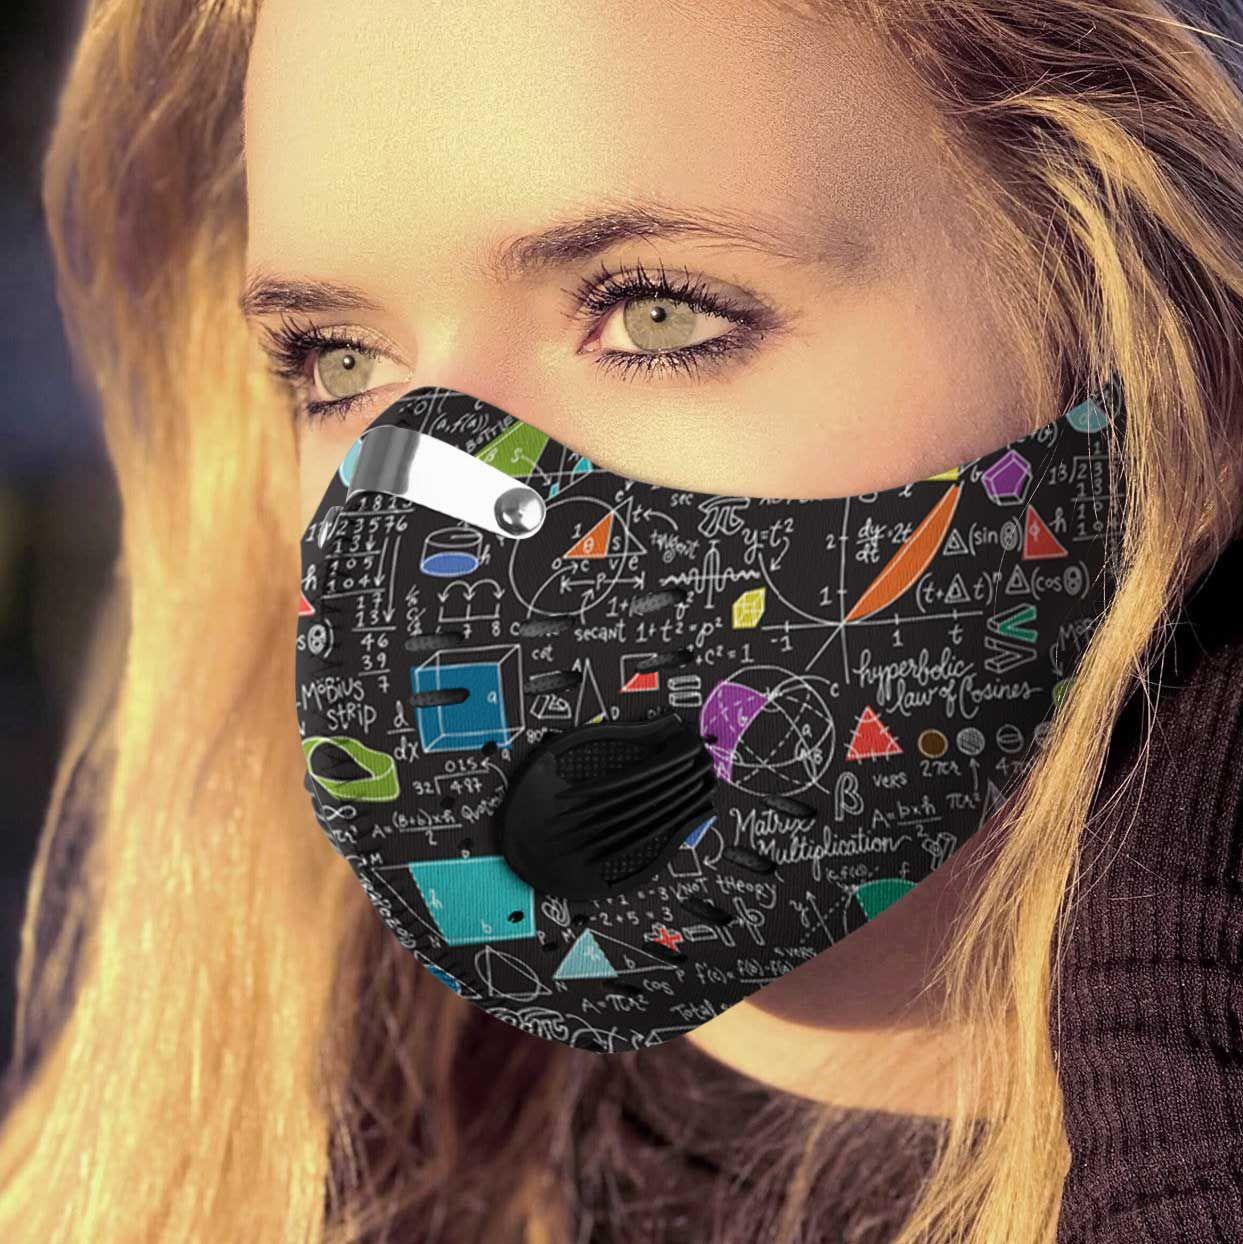 School math board carbon pm 2,5 face mask 2